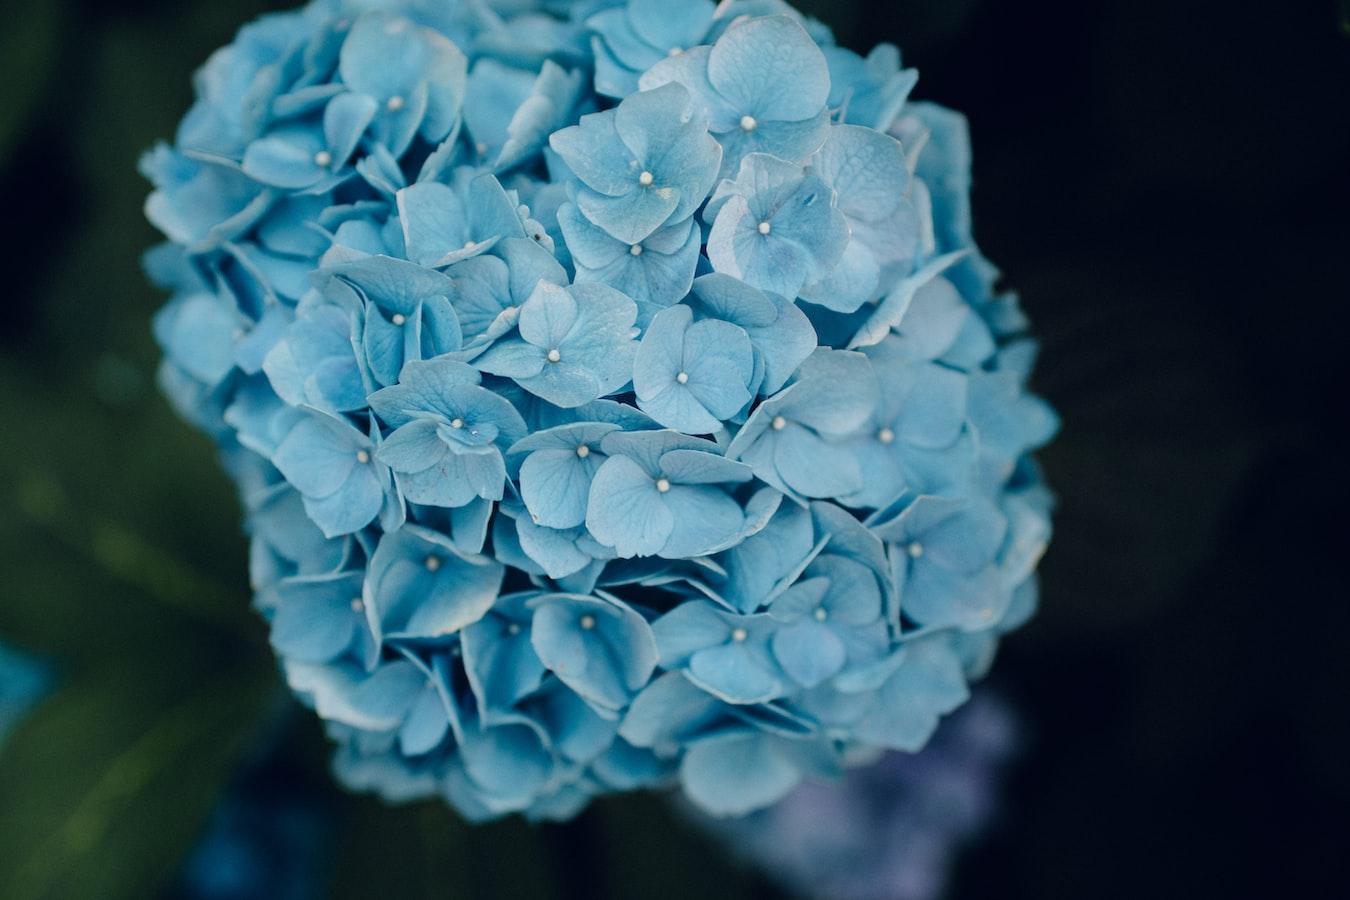 light-blu-flower